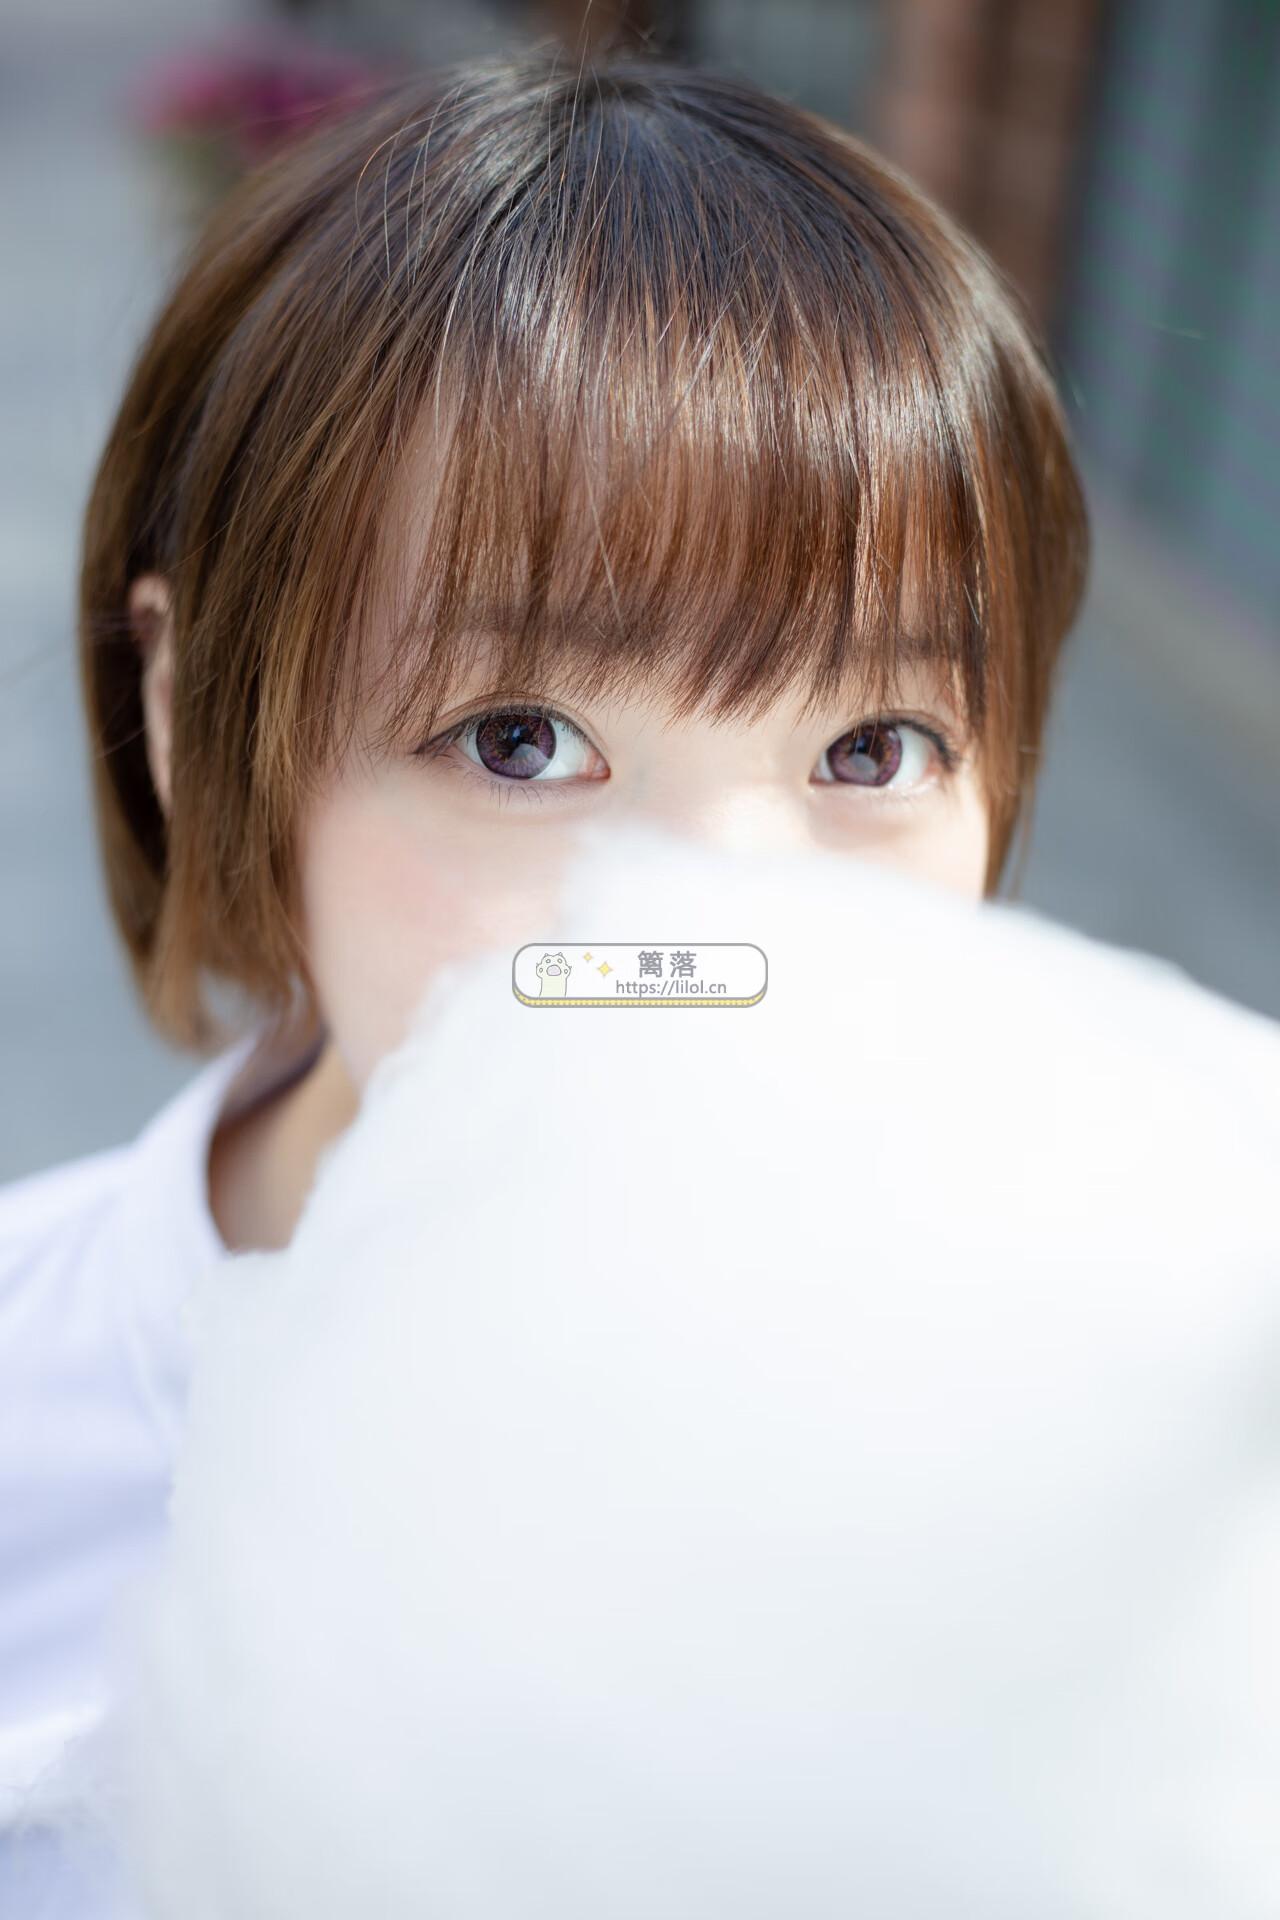 【SSR系列】森萝财团写真 SSR-011 短发俏皮学生妹天台+公园长椅写真 [104图-0视频-1.4GB] SSR系列 第2张